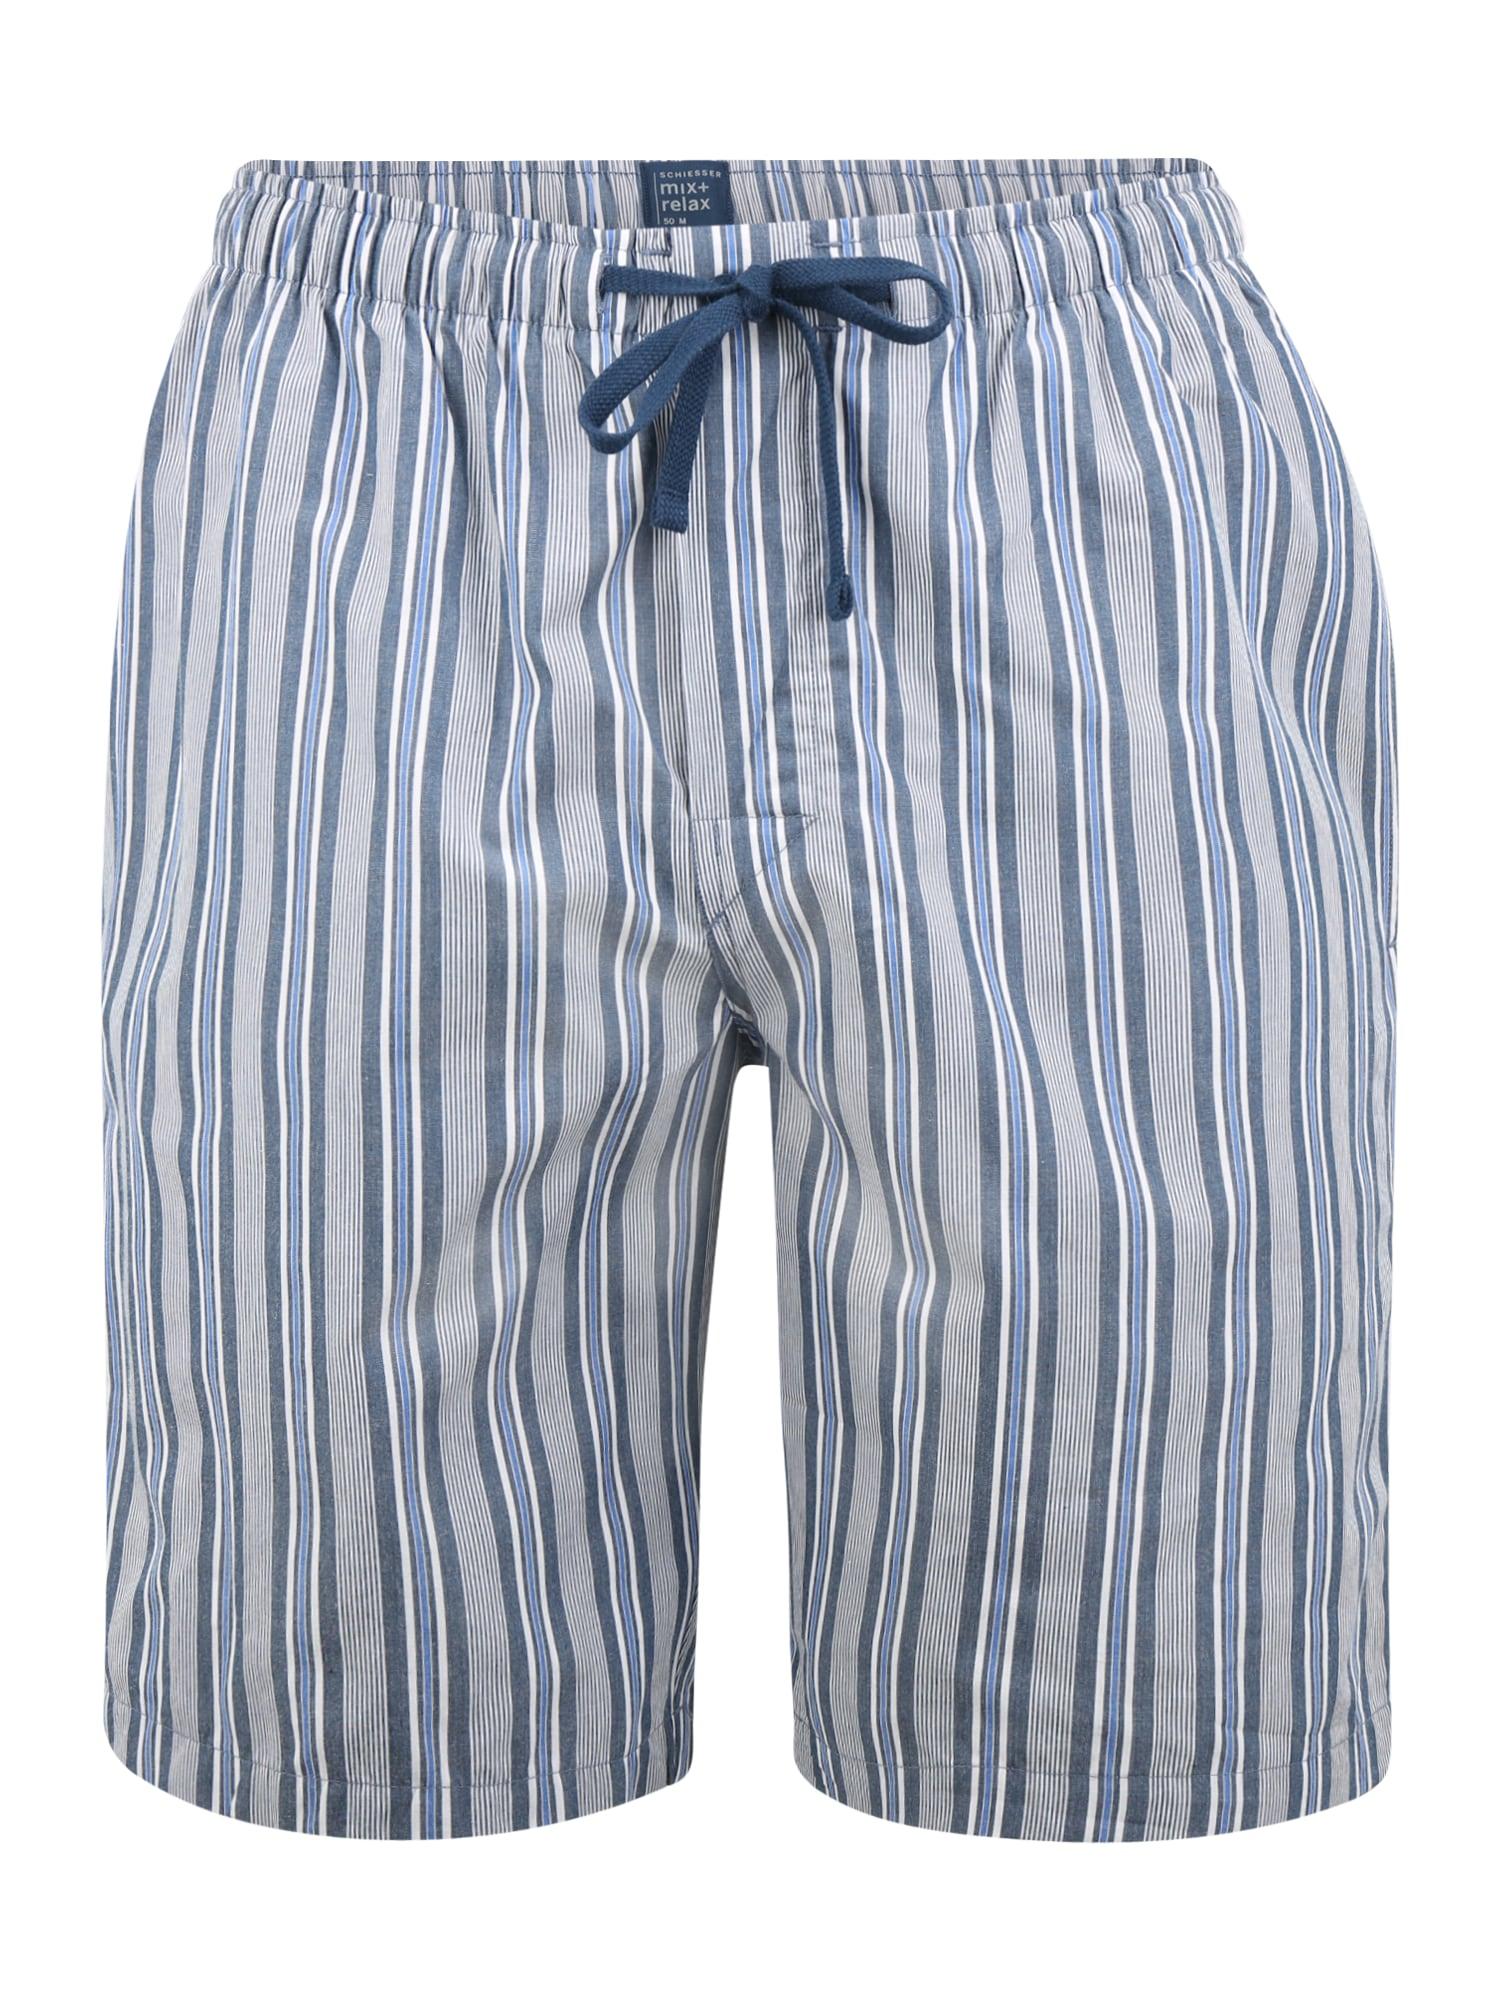 SCHIESSER Pižaminės kelnės mėlyna